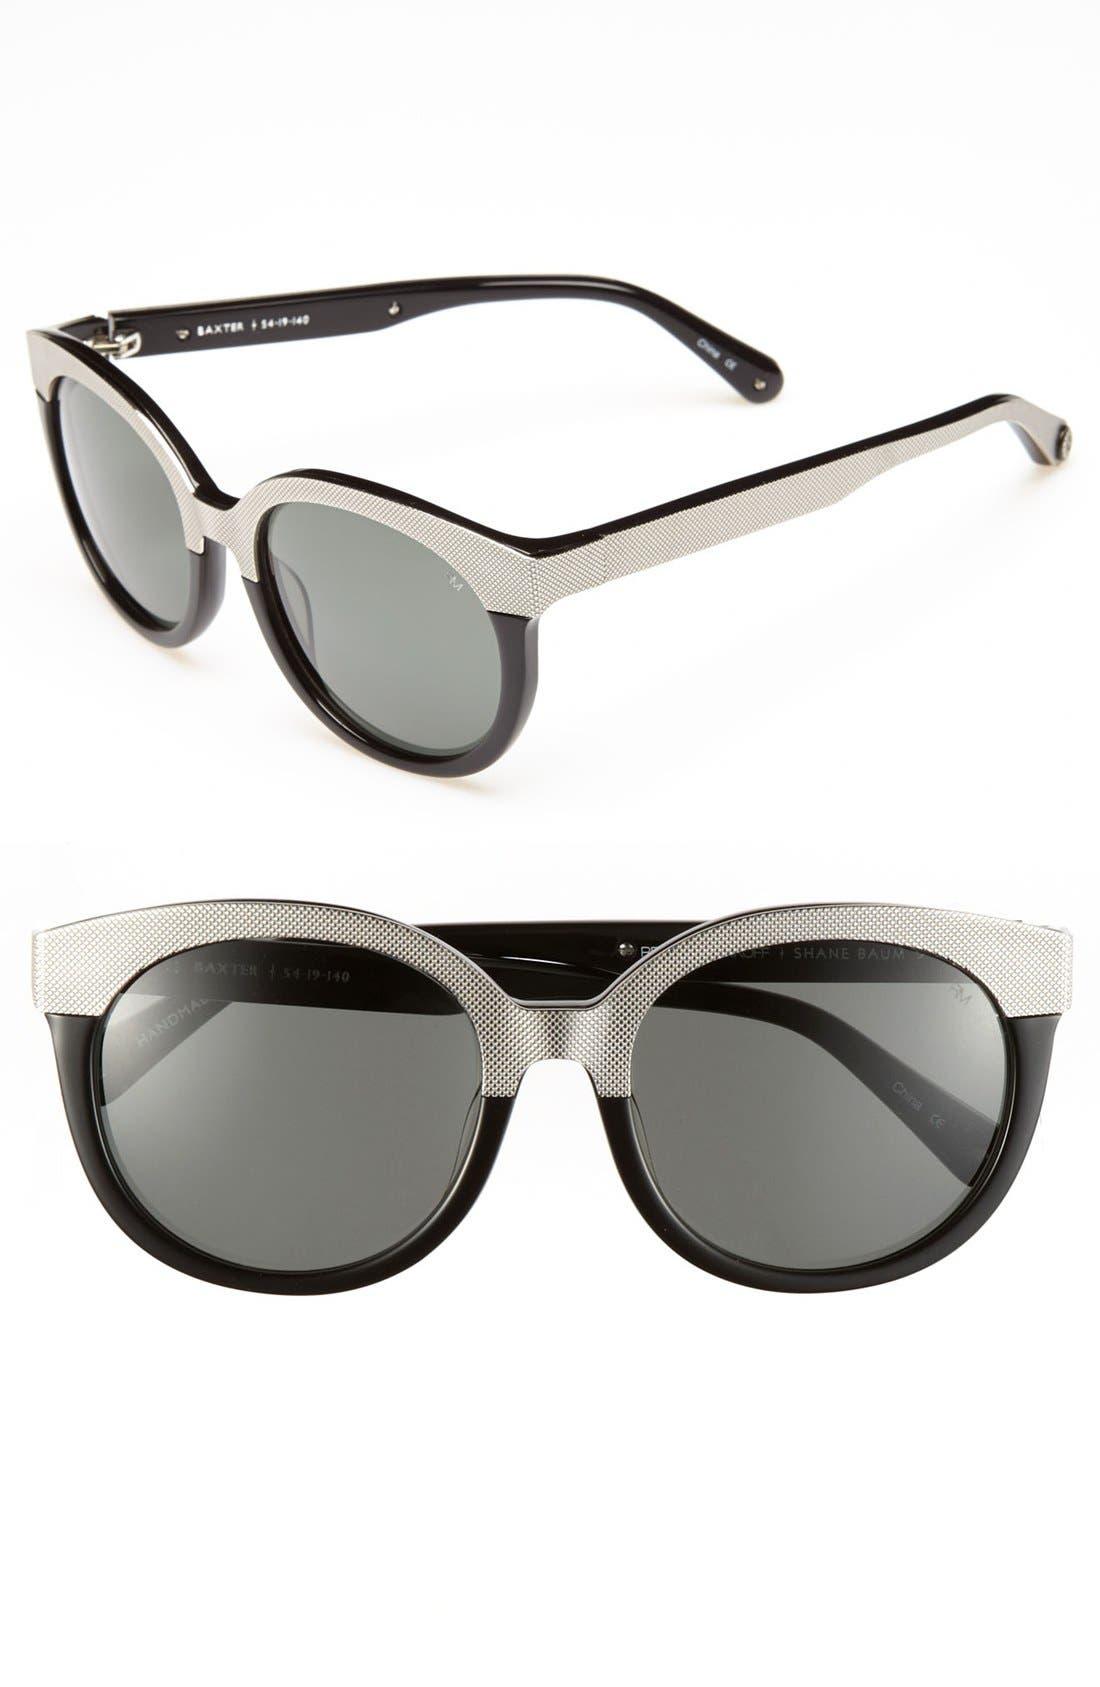 Main Image - Rebecca Minkoff 'Baxter' Sunglasses